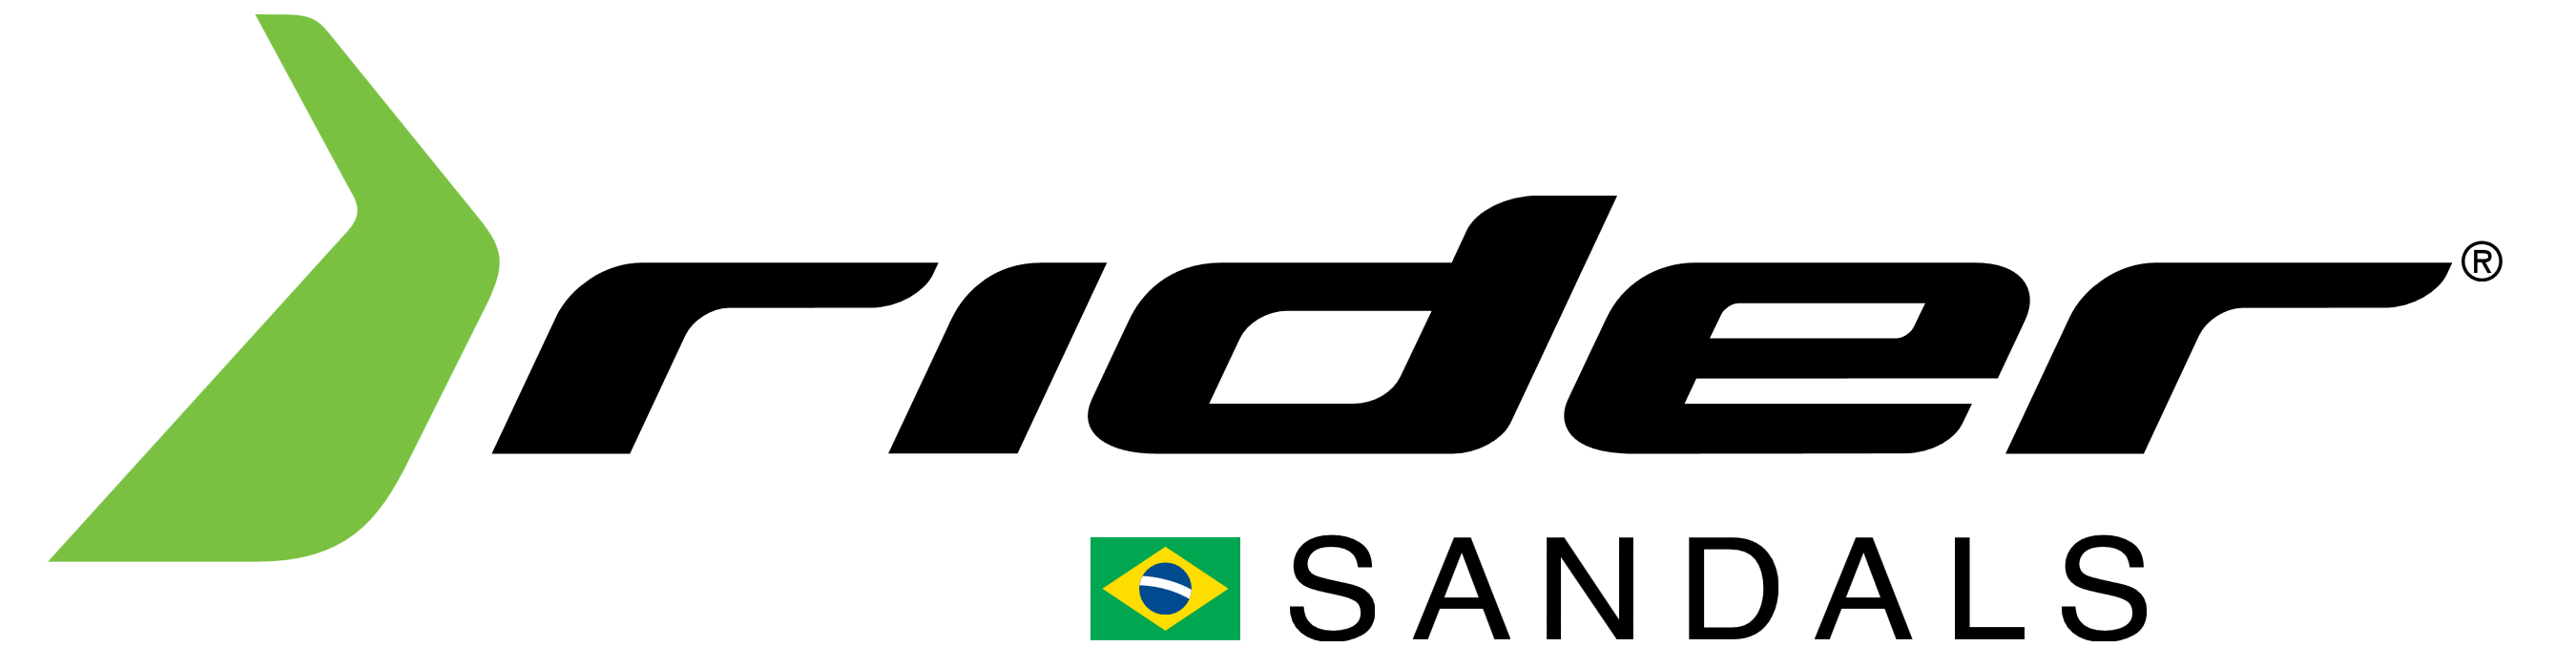 Rider Sandals Logos Download